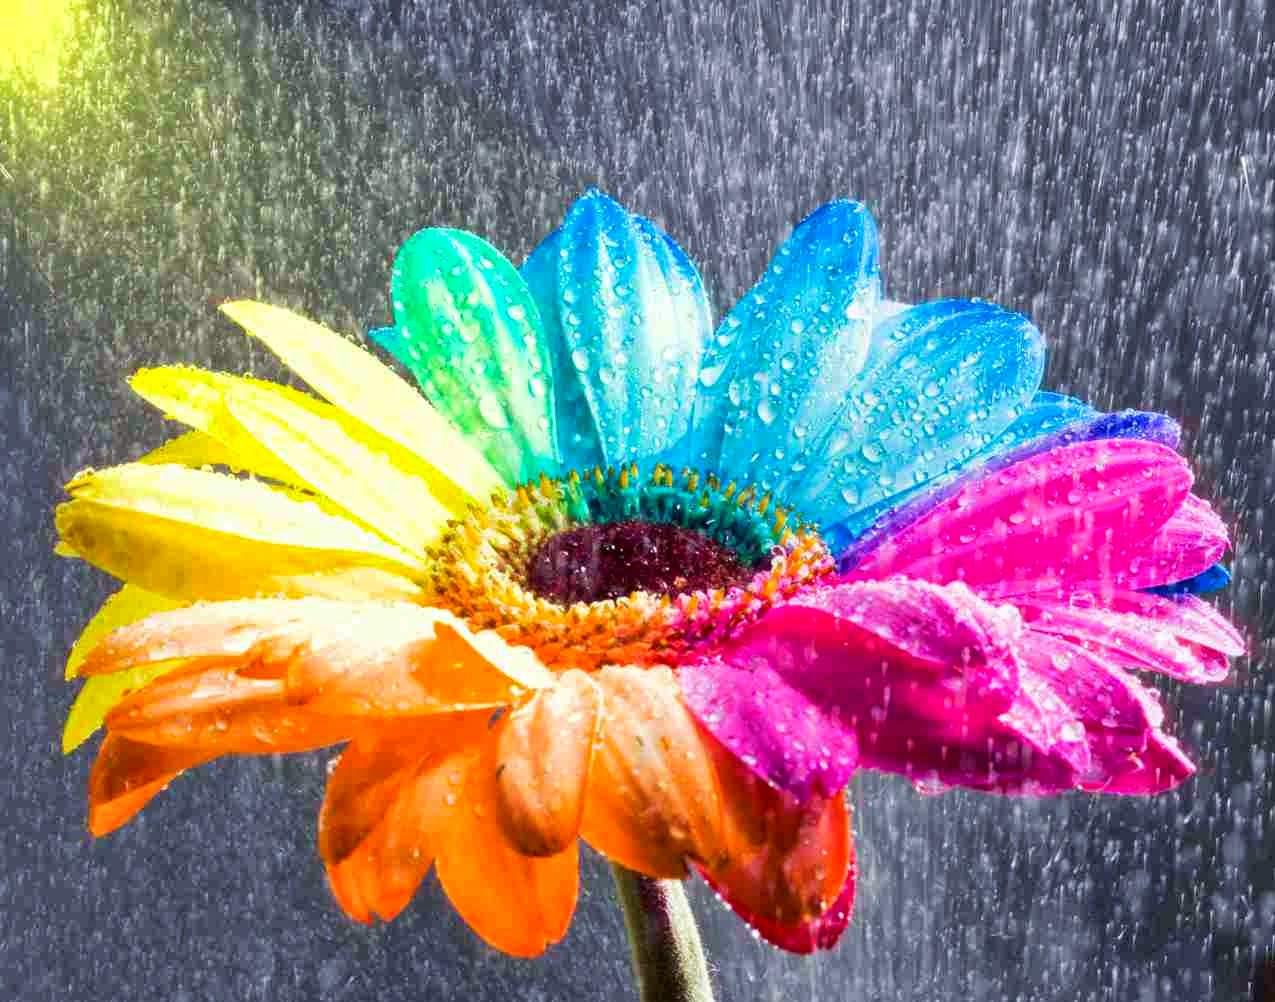 Free Colorful Flower Wallpaper Downloads: All 4u HD Wallpaper Free Download : Beautiful Rainbow